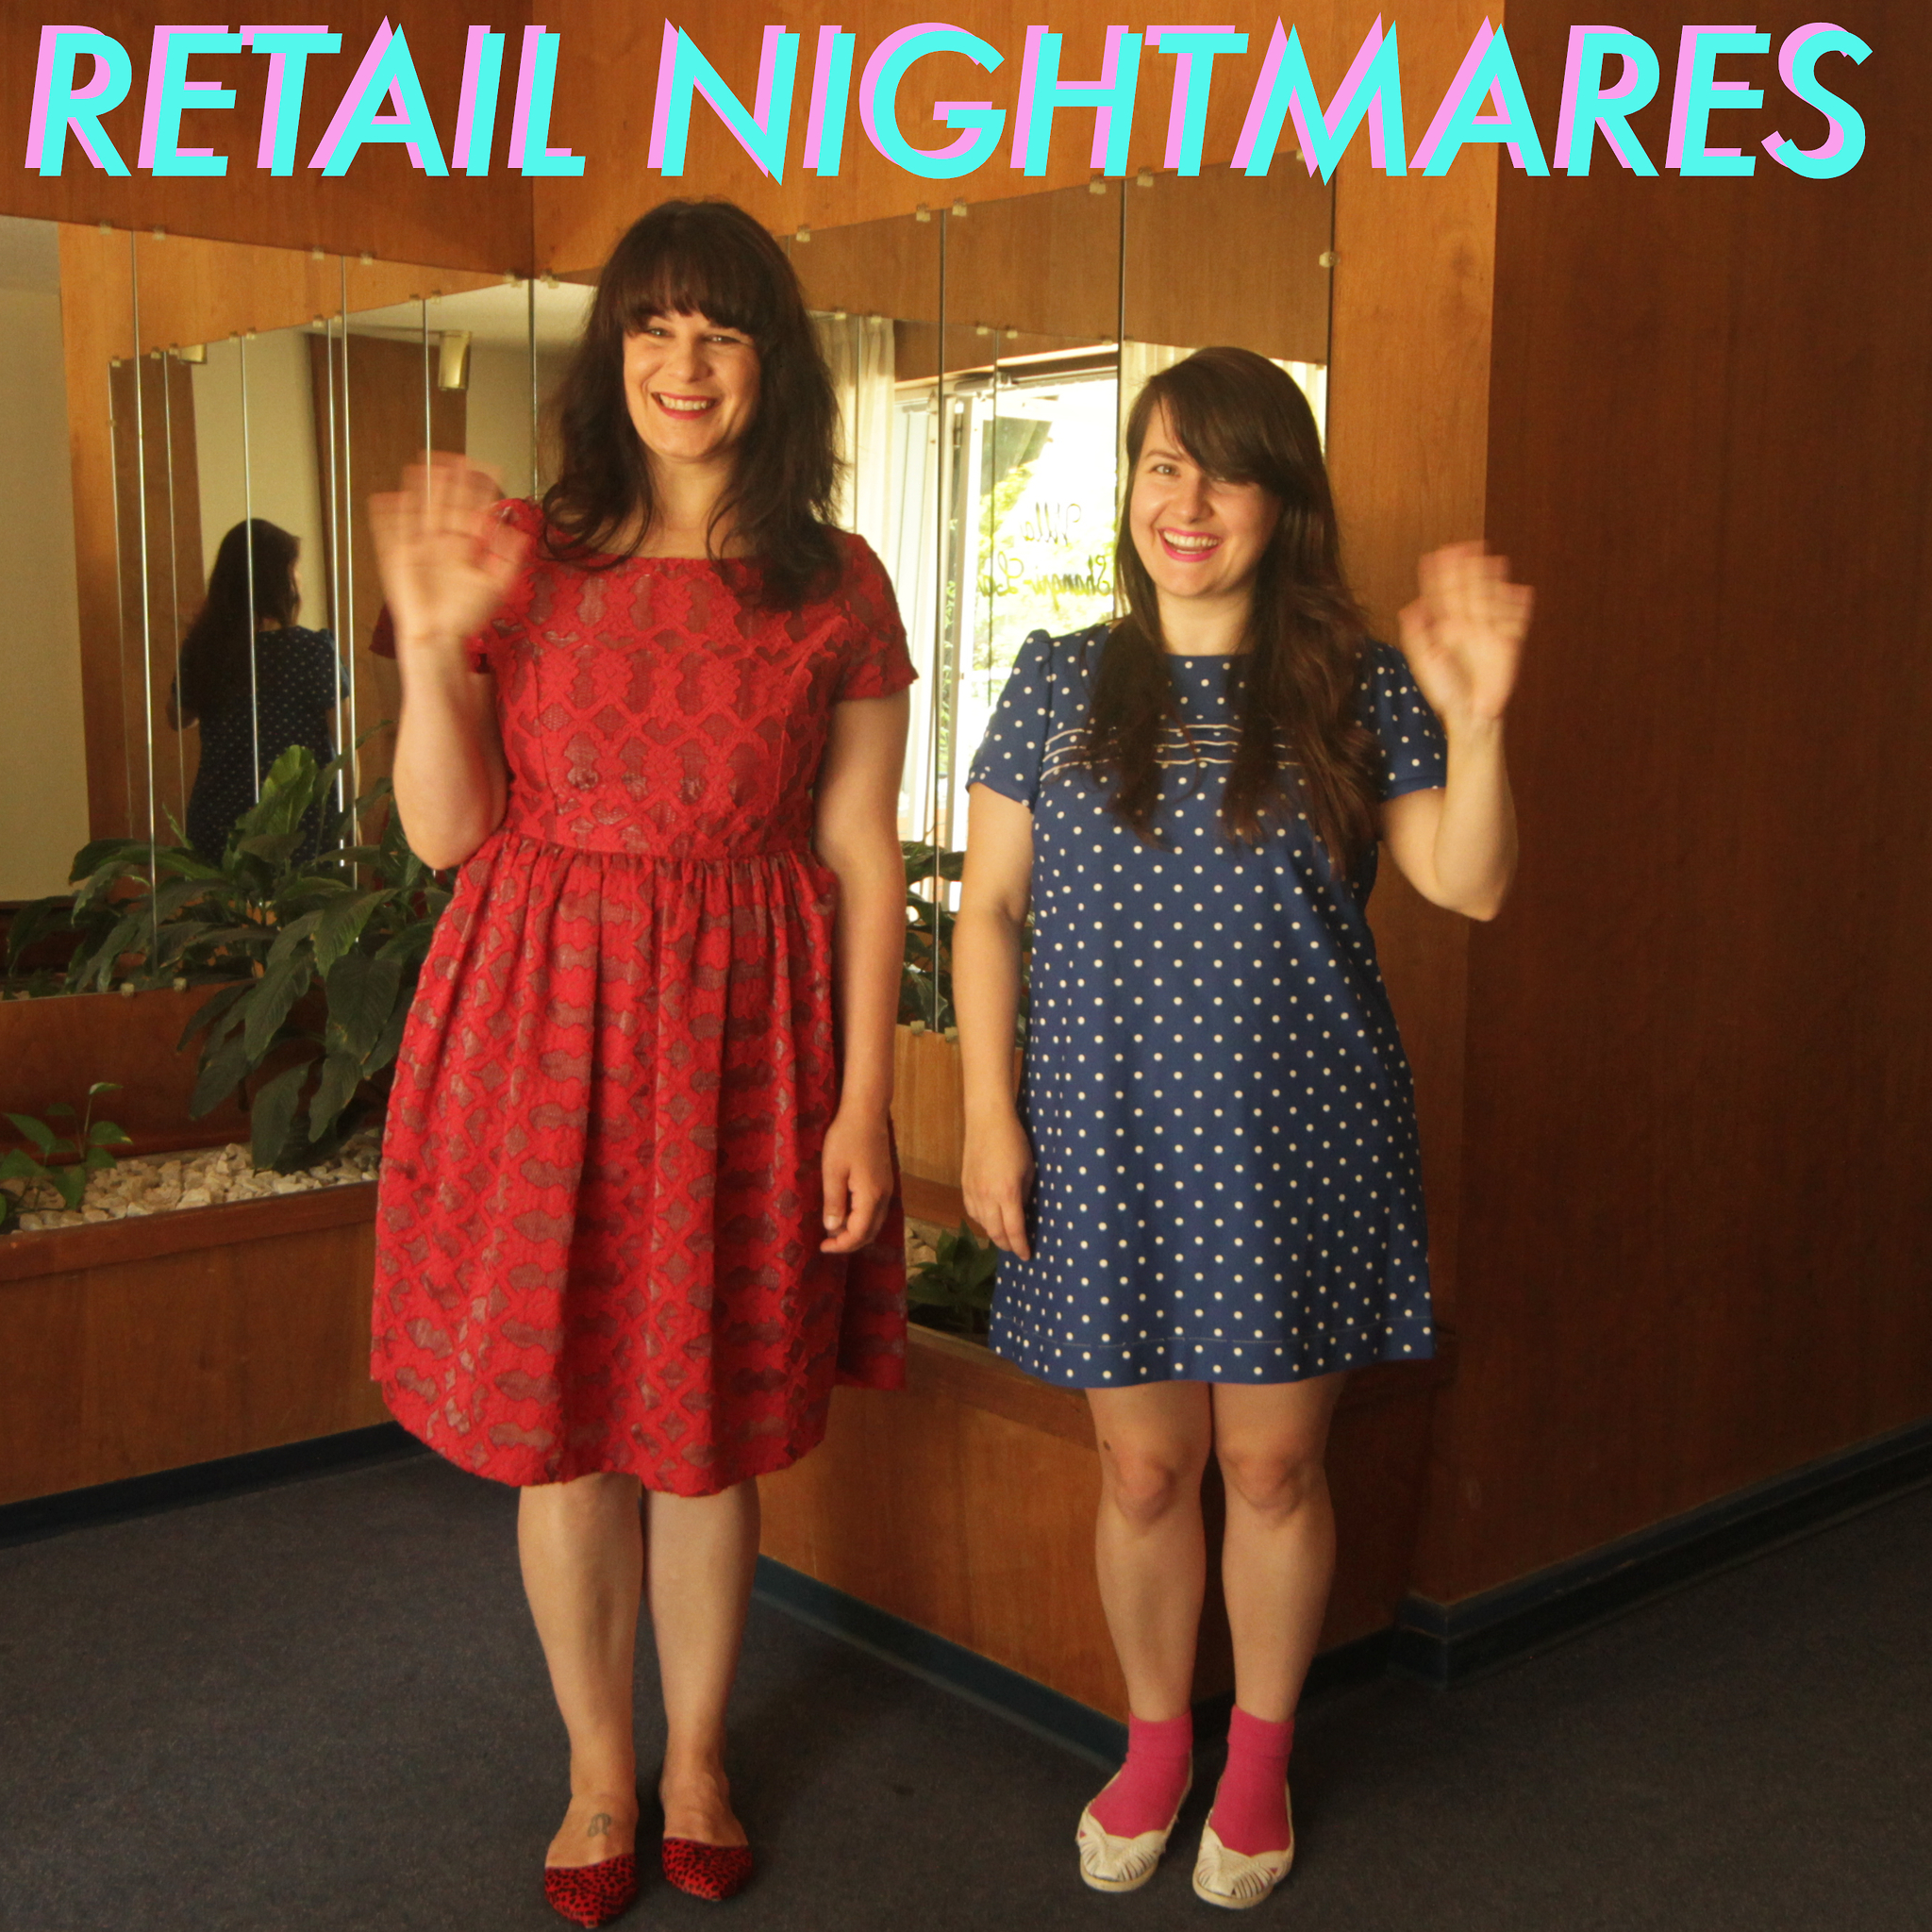 retail-nightmares-stacey-mclachlan